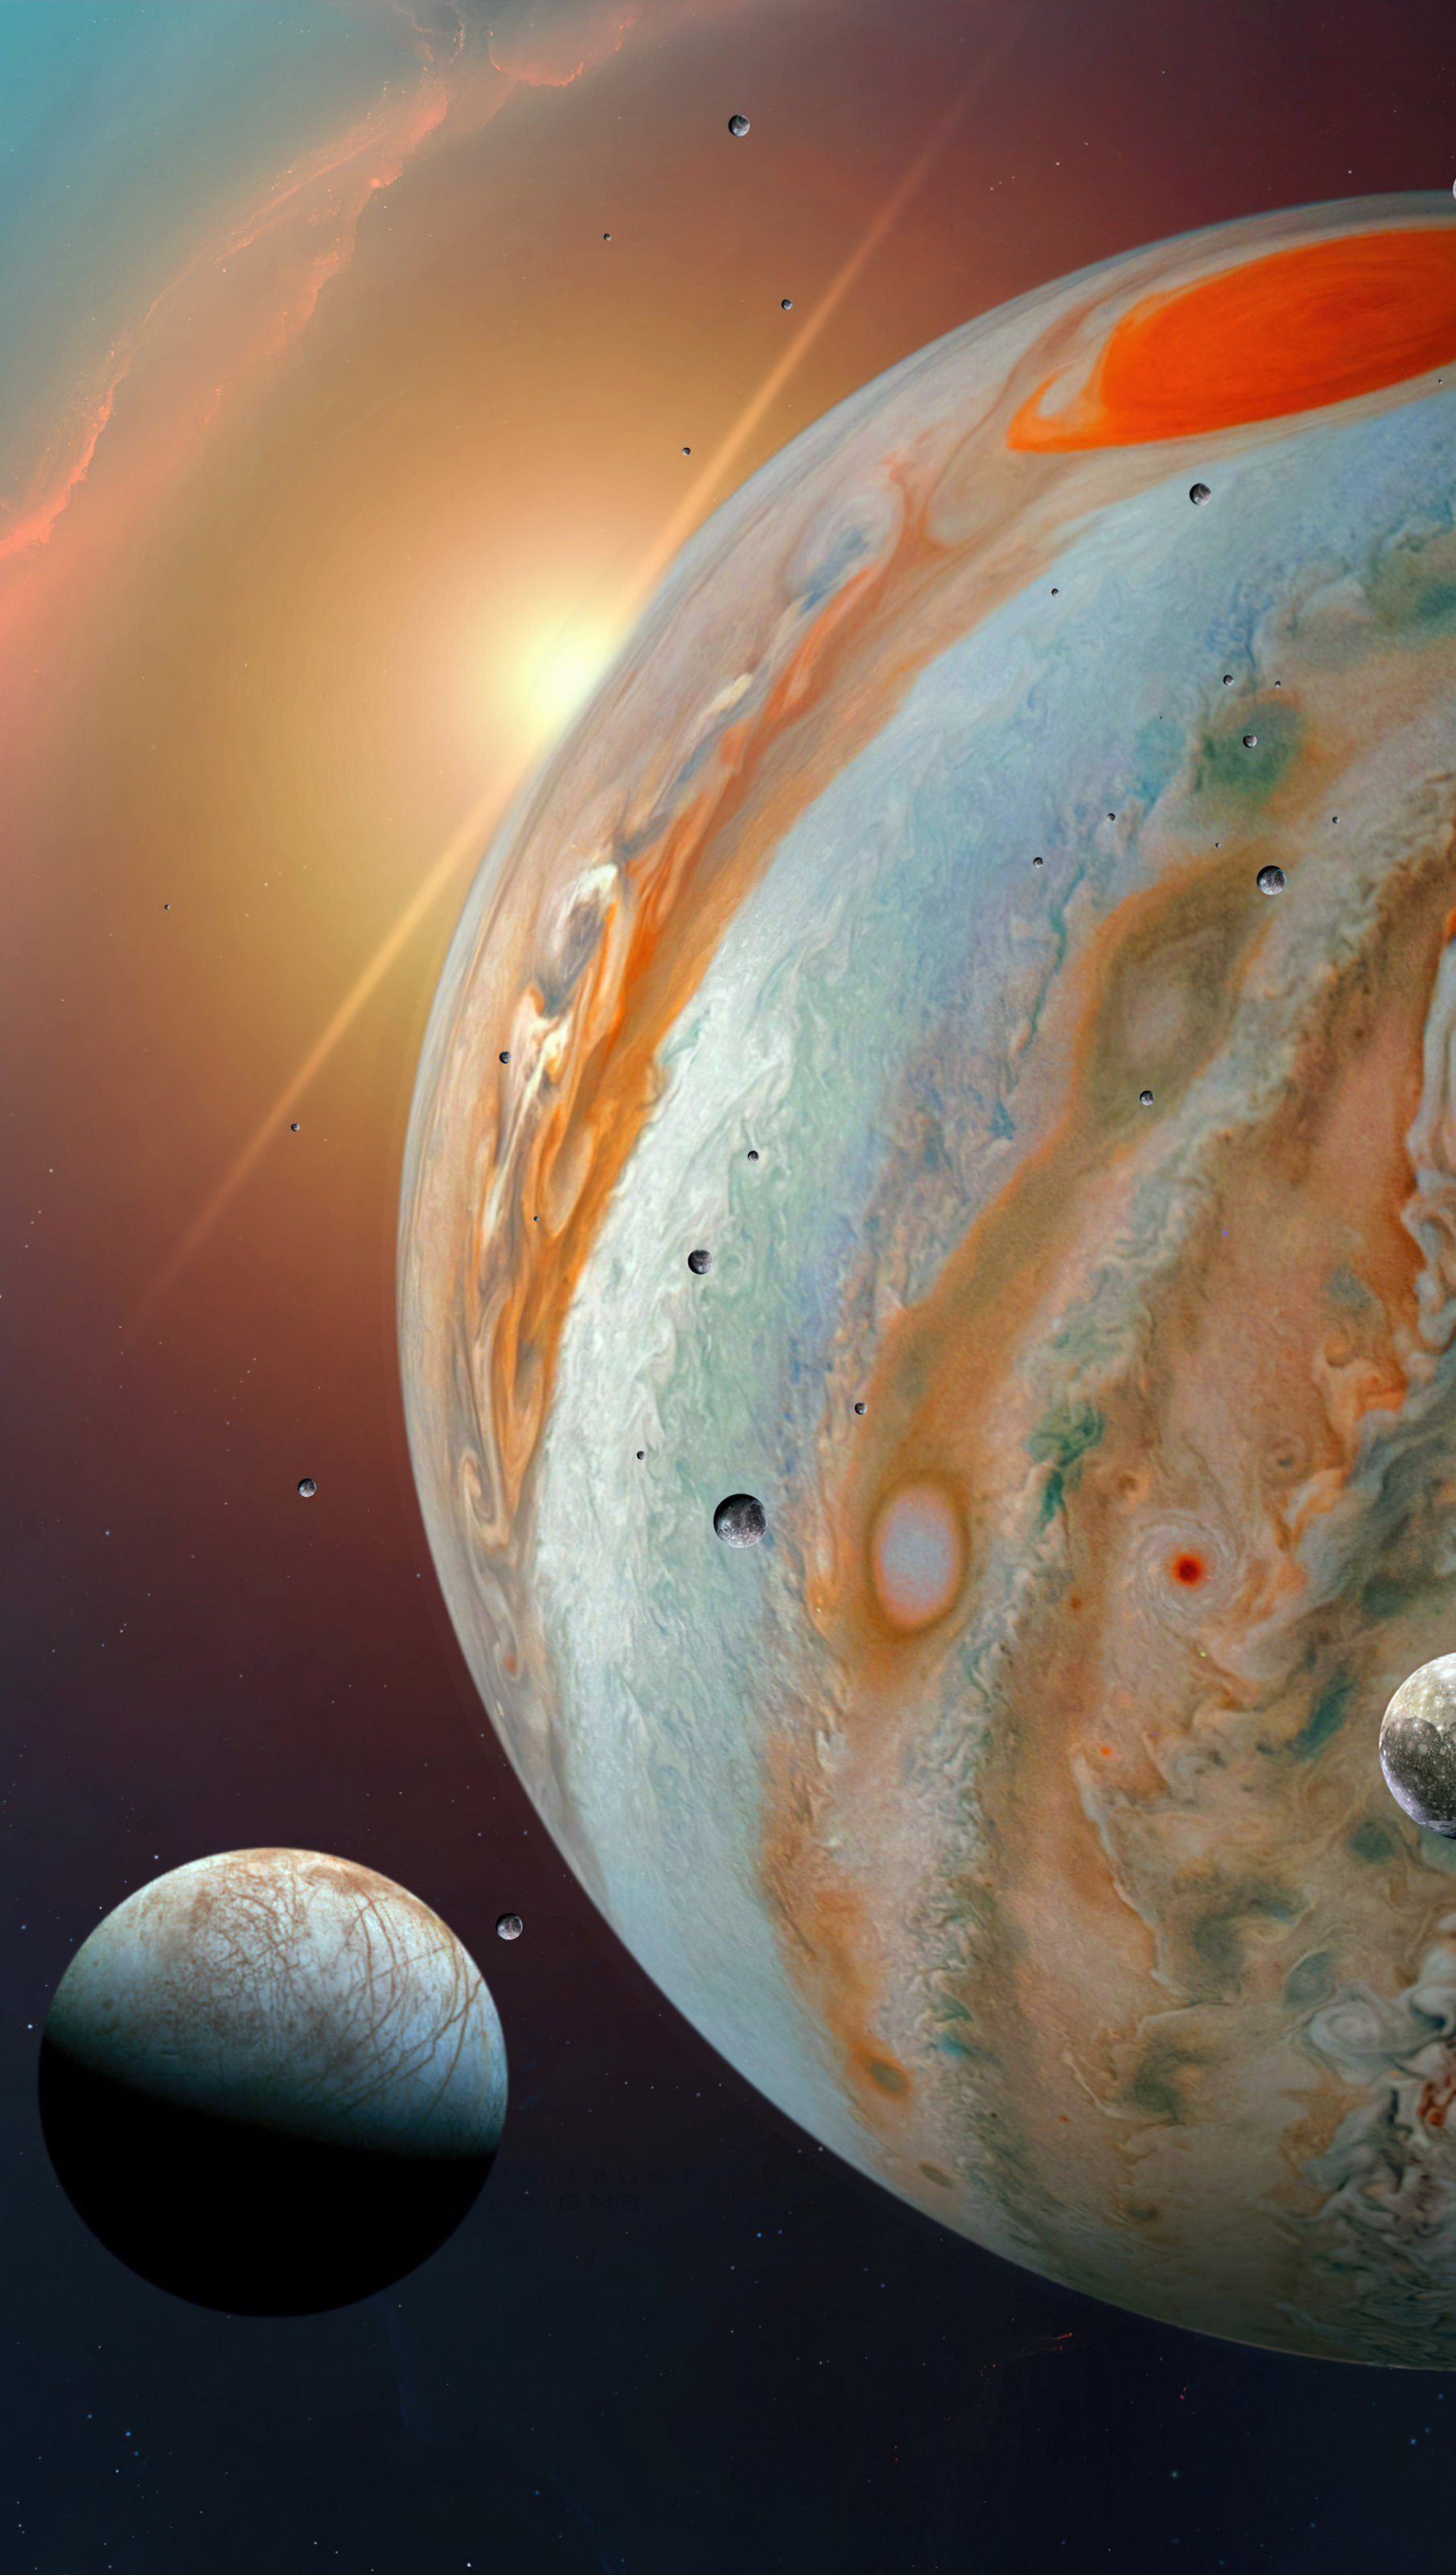 Wallpaper Jupiter and its moons Vertical